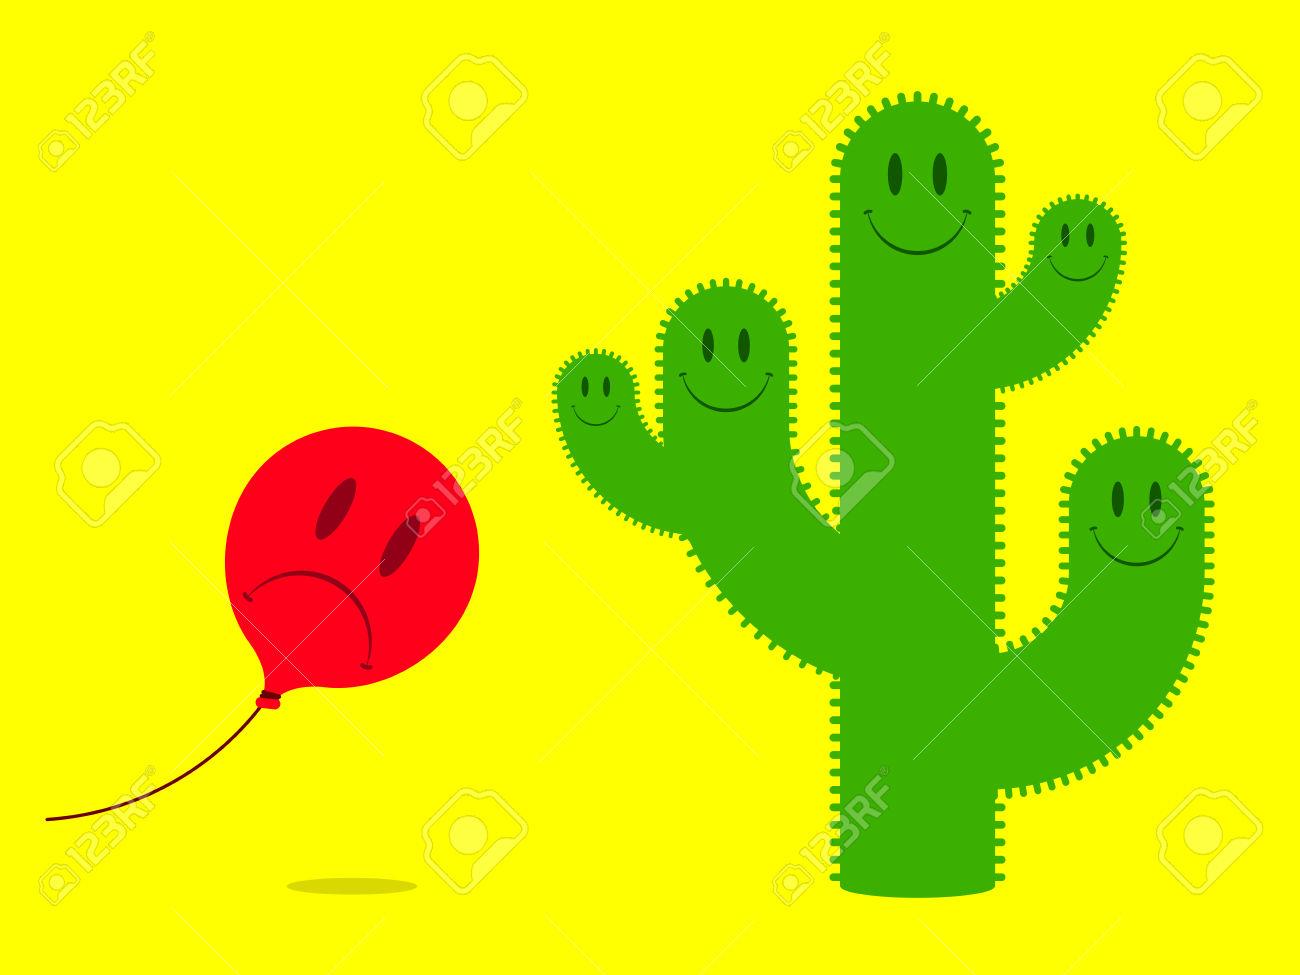 Cactus clipart face. Smiley